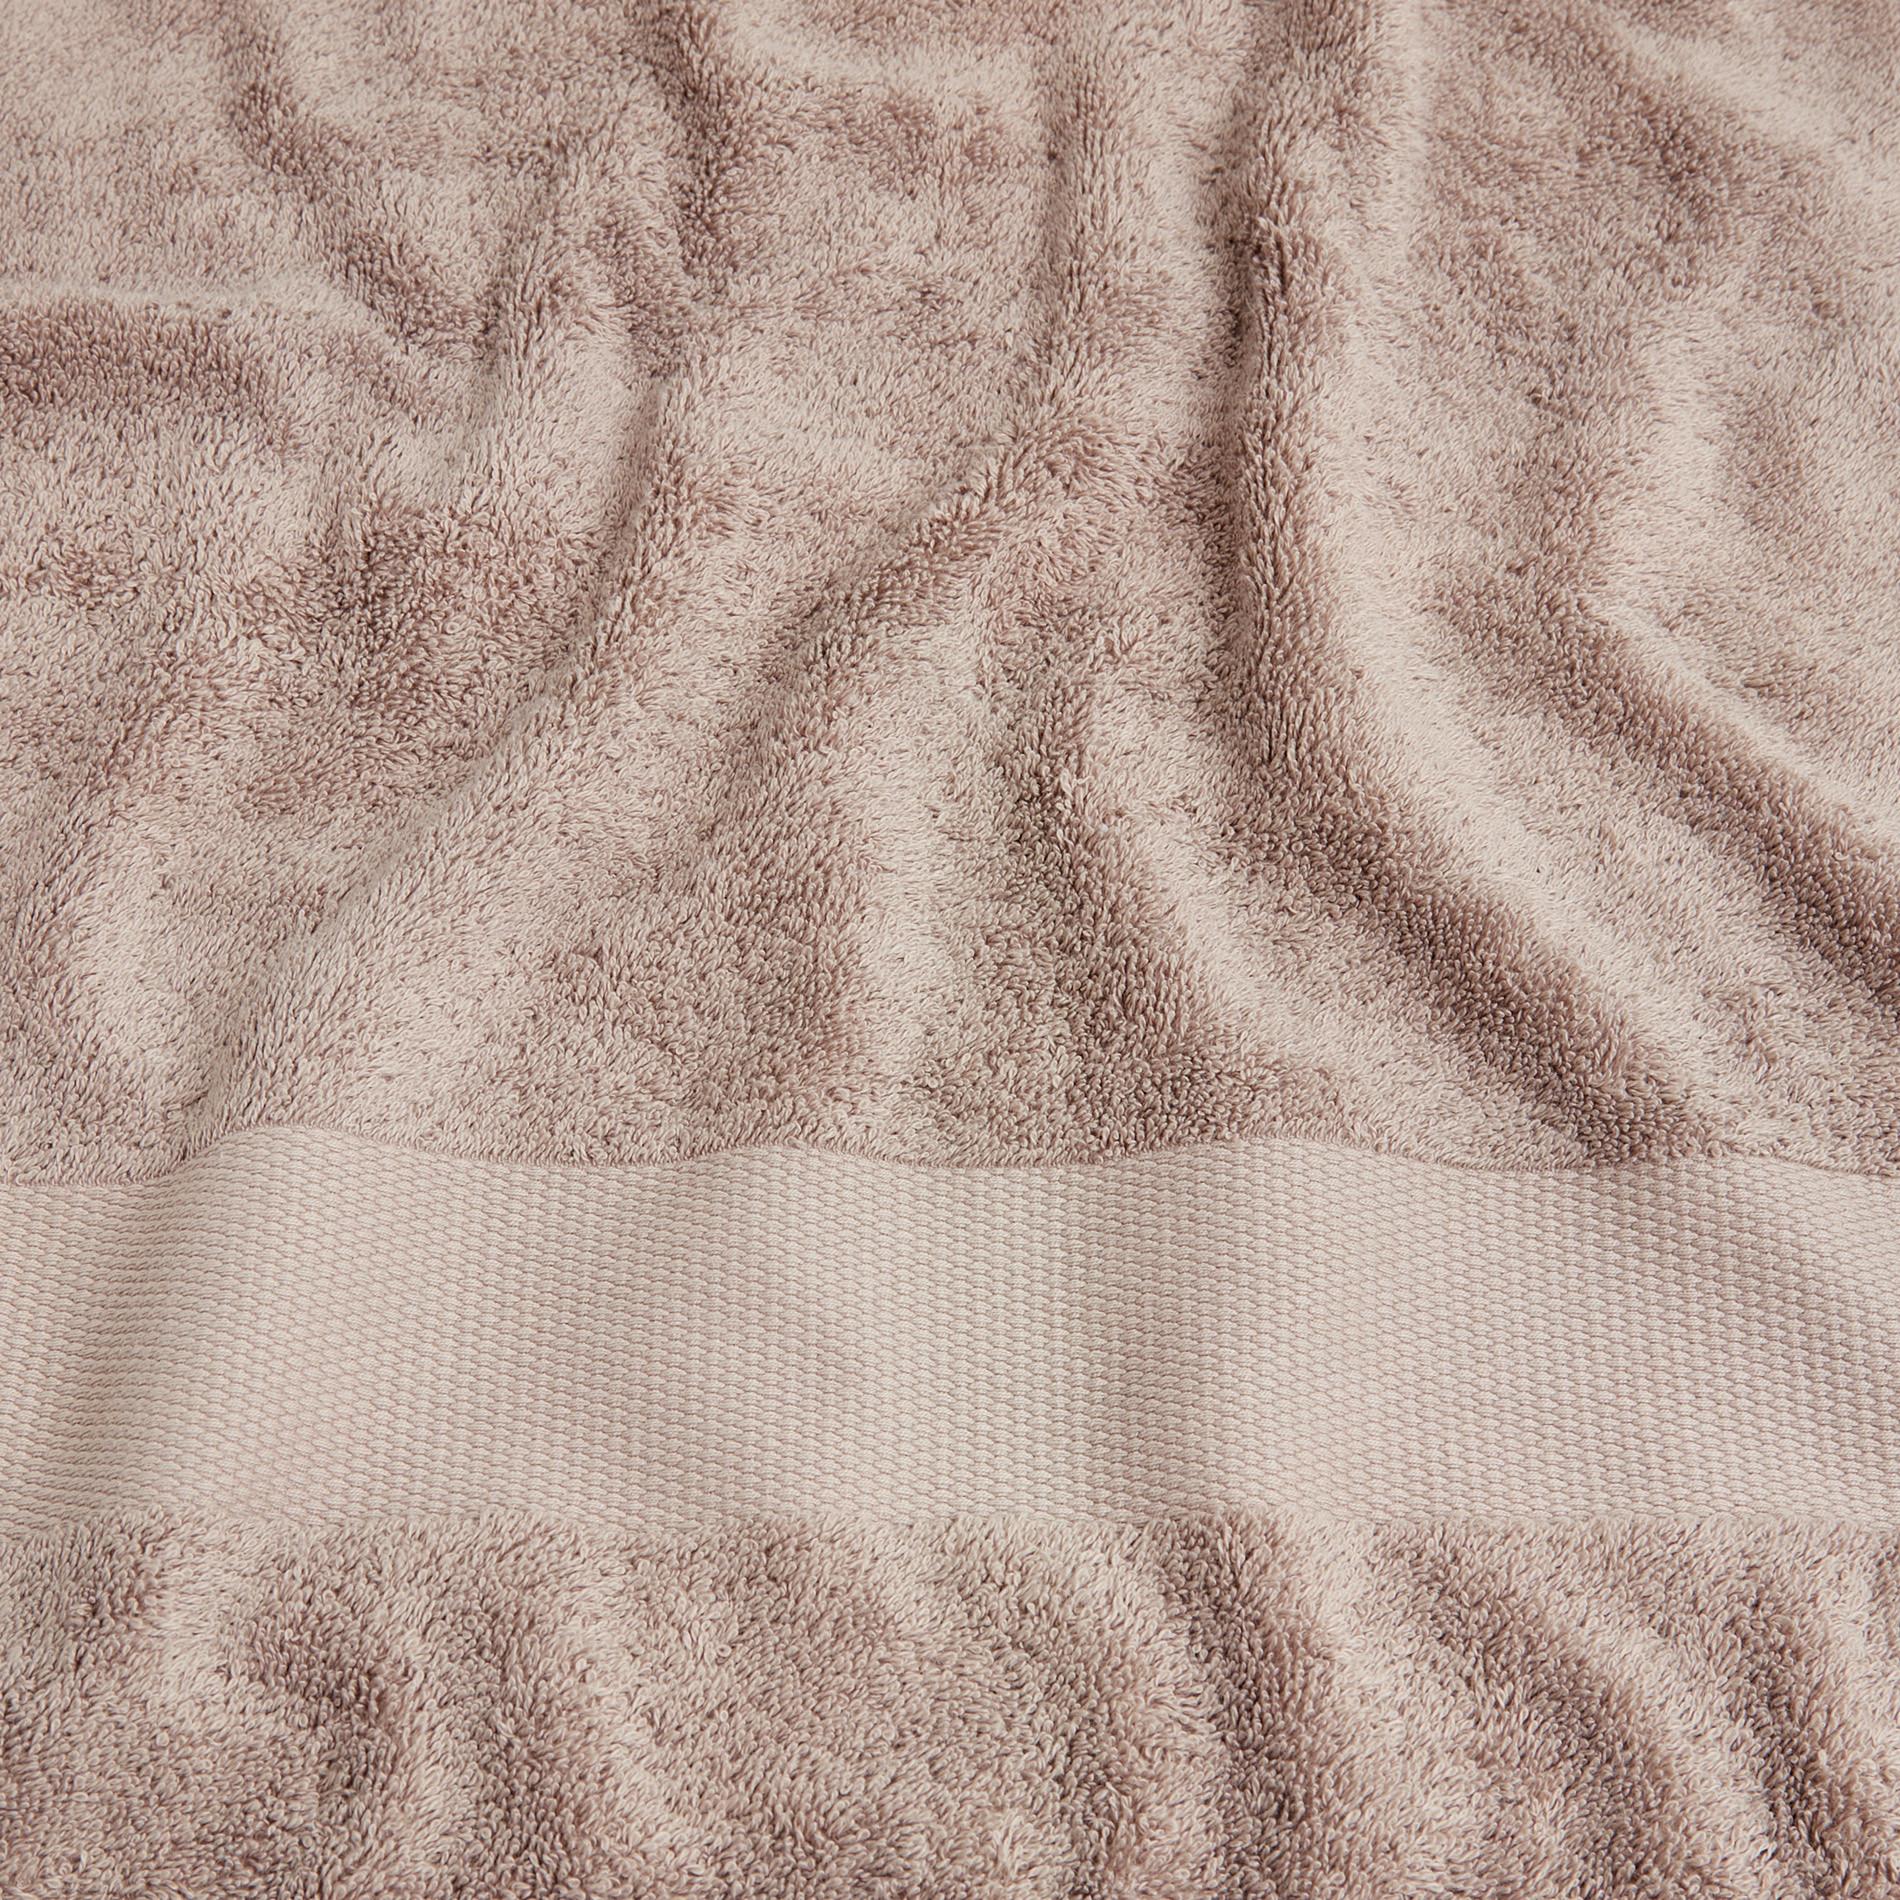 Asciugamano spugna di puro cotone Zefiro, Marrone, large image number 3